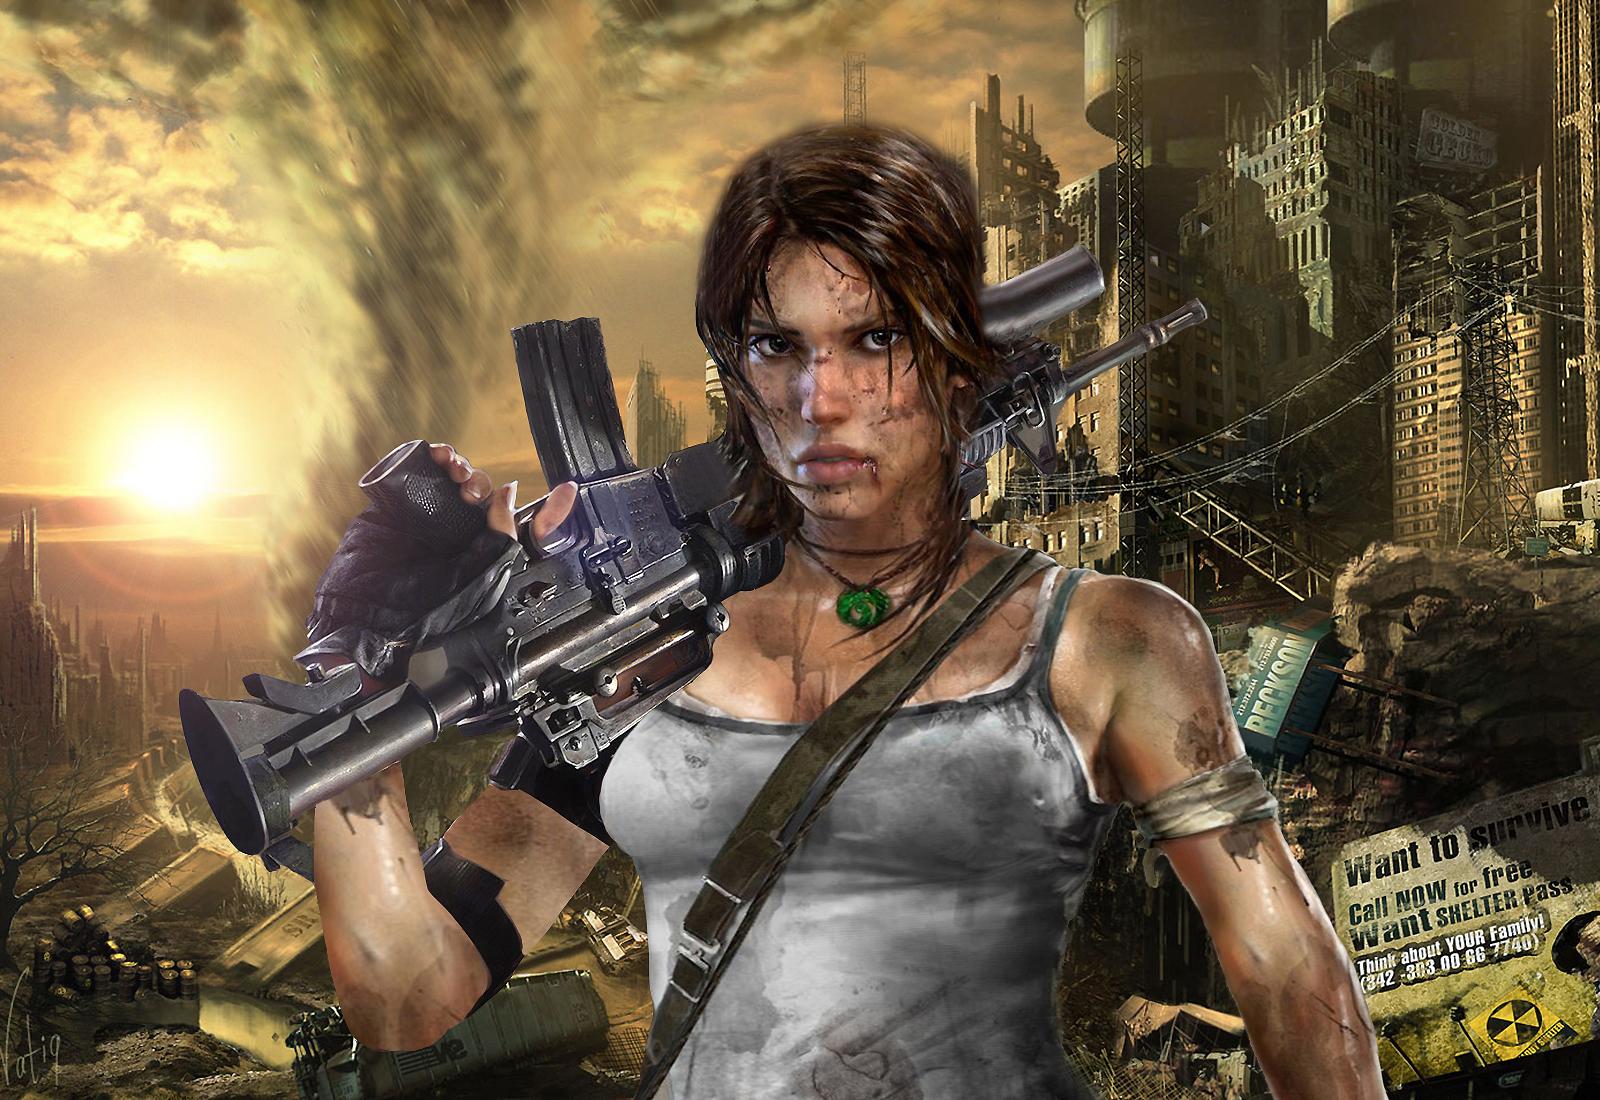 Lara Croft in the City